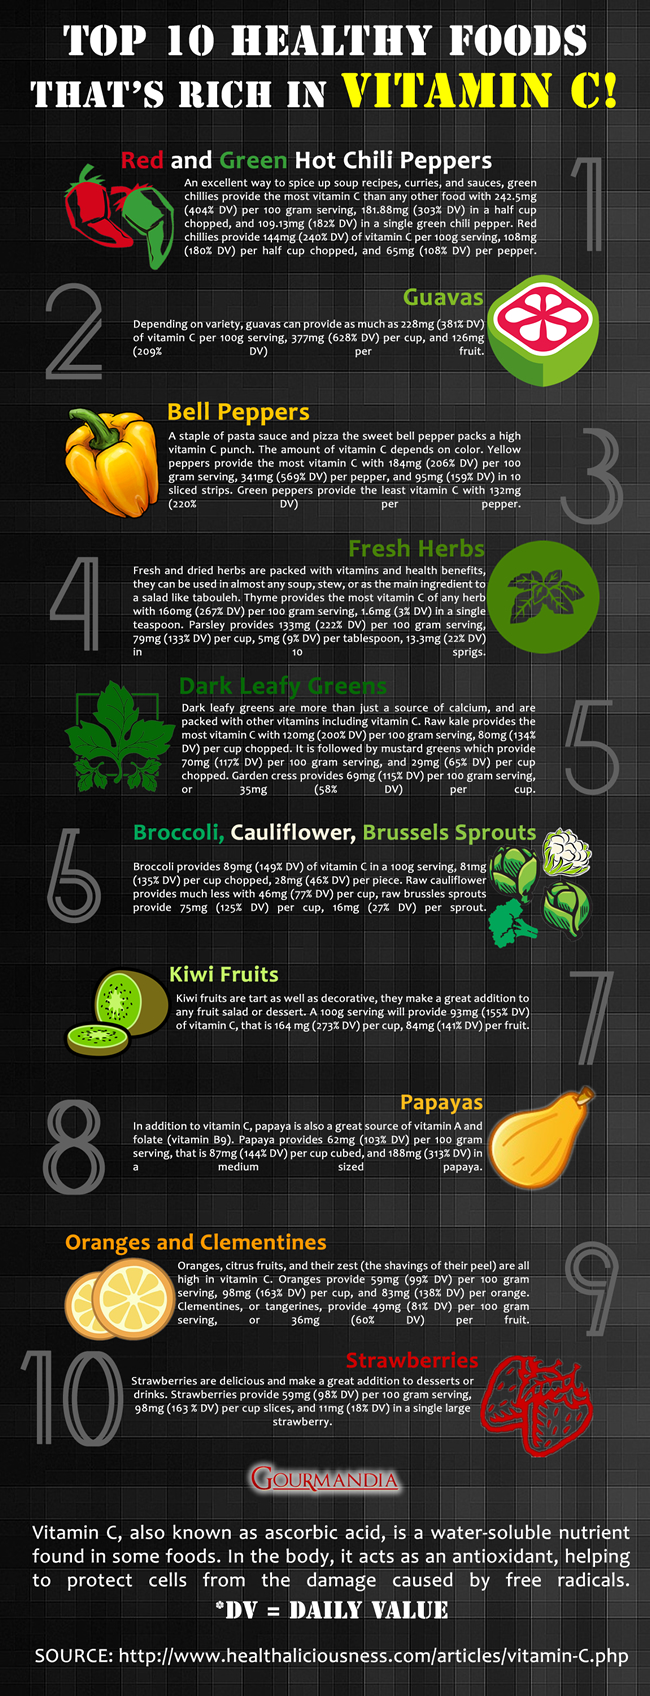 top-10-healthy-foods-thats-rich-in-vitamin-c_525b8c3c852b7